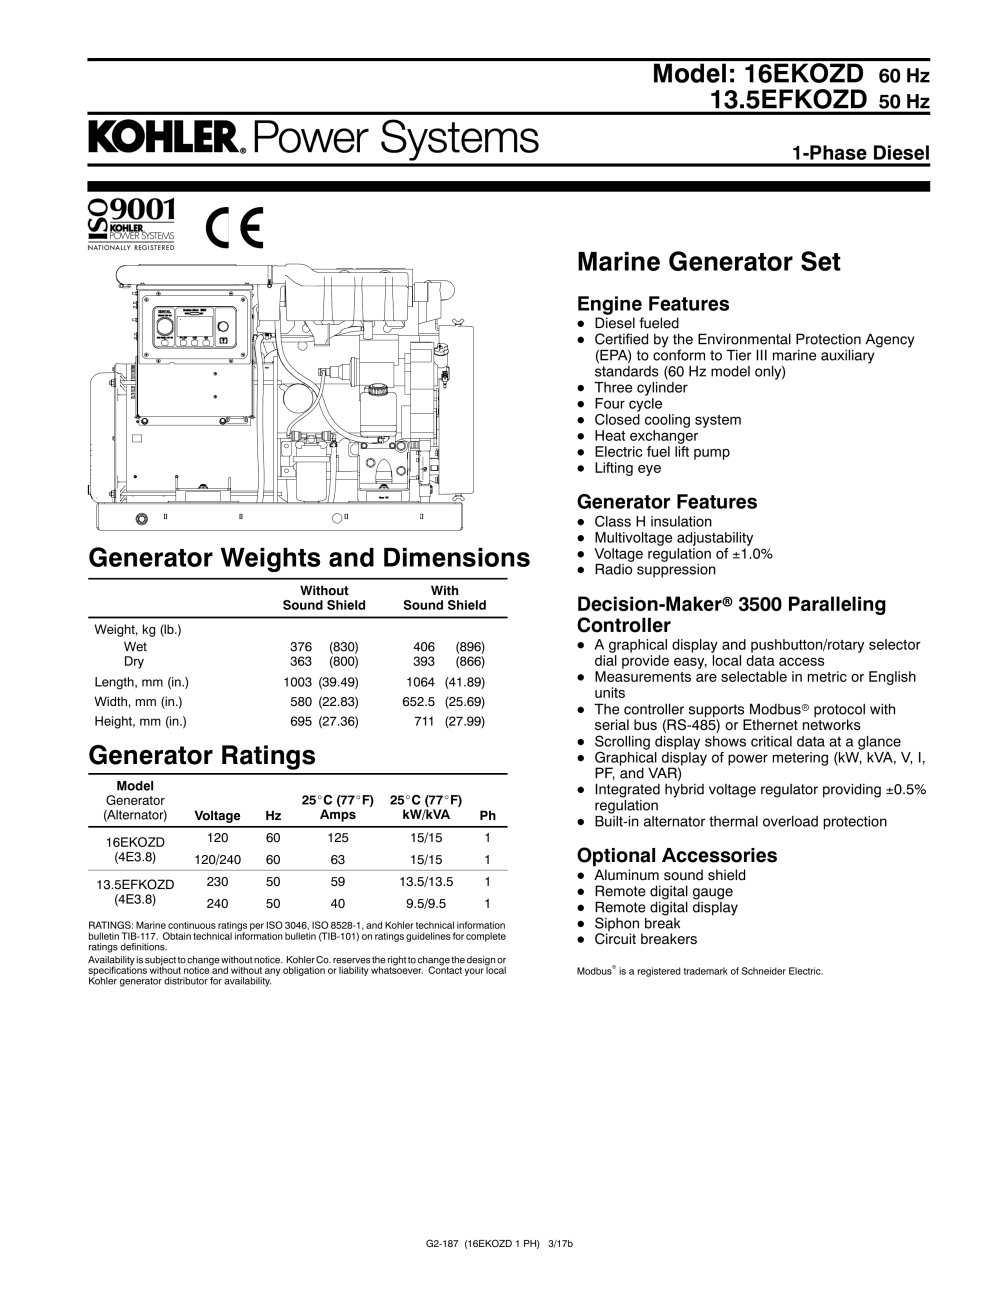 13.5EFKOZD - KOHLER POWER SYSTEMS - PDF Catalogue | Technical ...